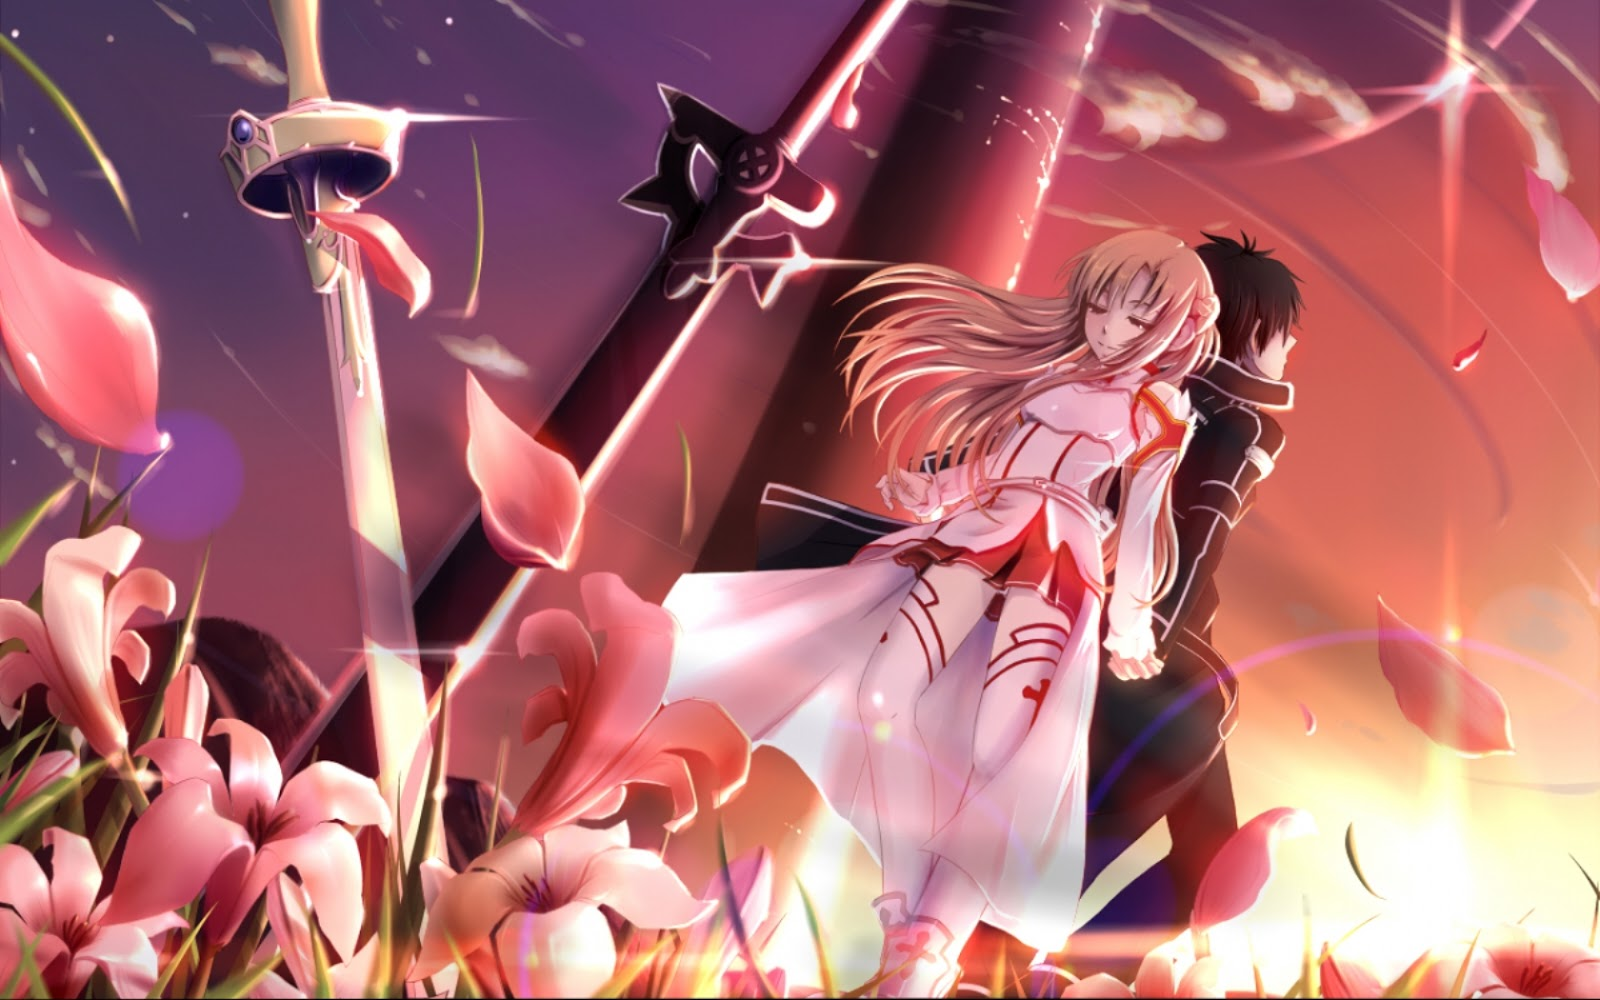 Princesa Abisal Top 10 Animes Romnticos 1600x1000